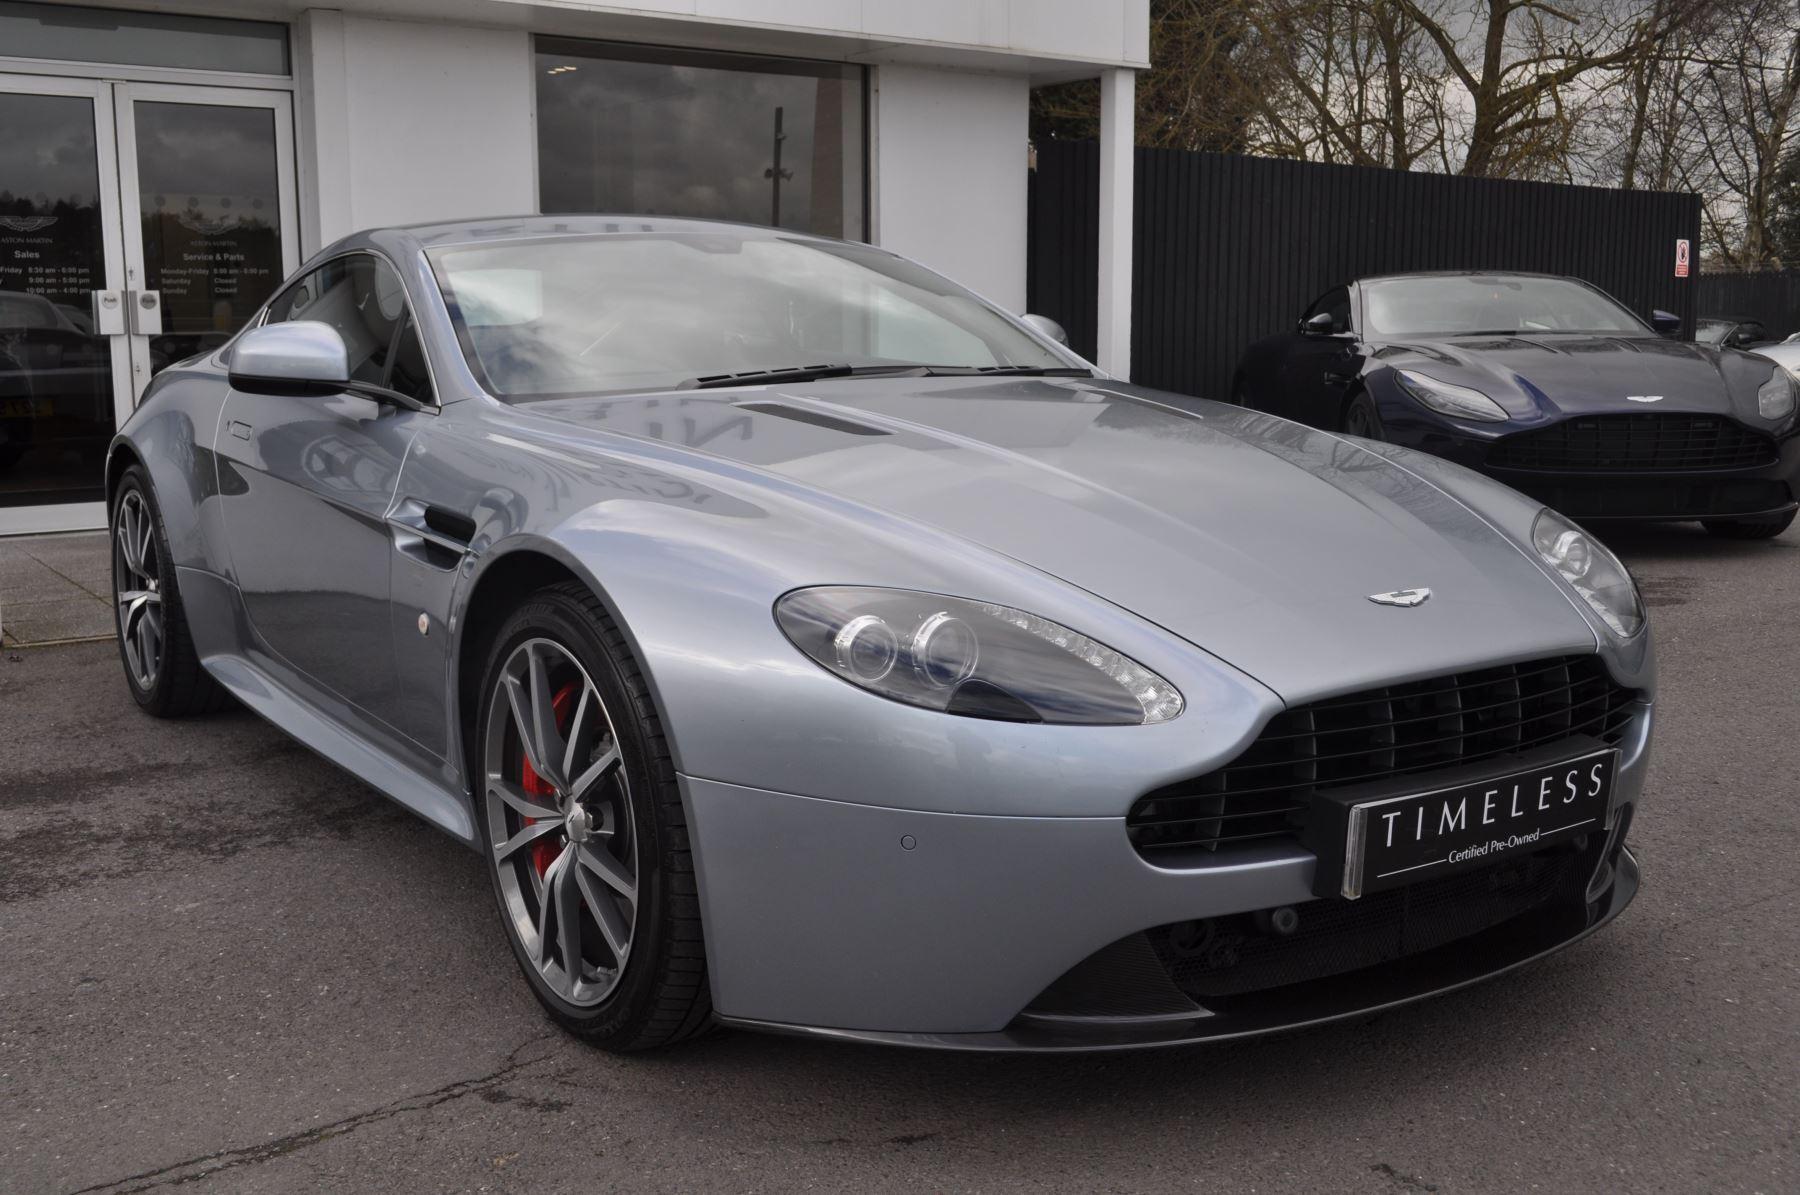 Aston Martin V8 Vantage S Coupe Coupe image 17